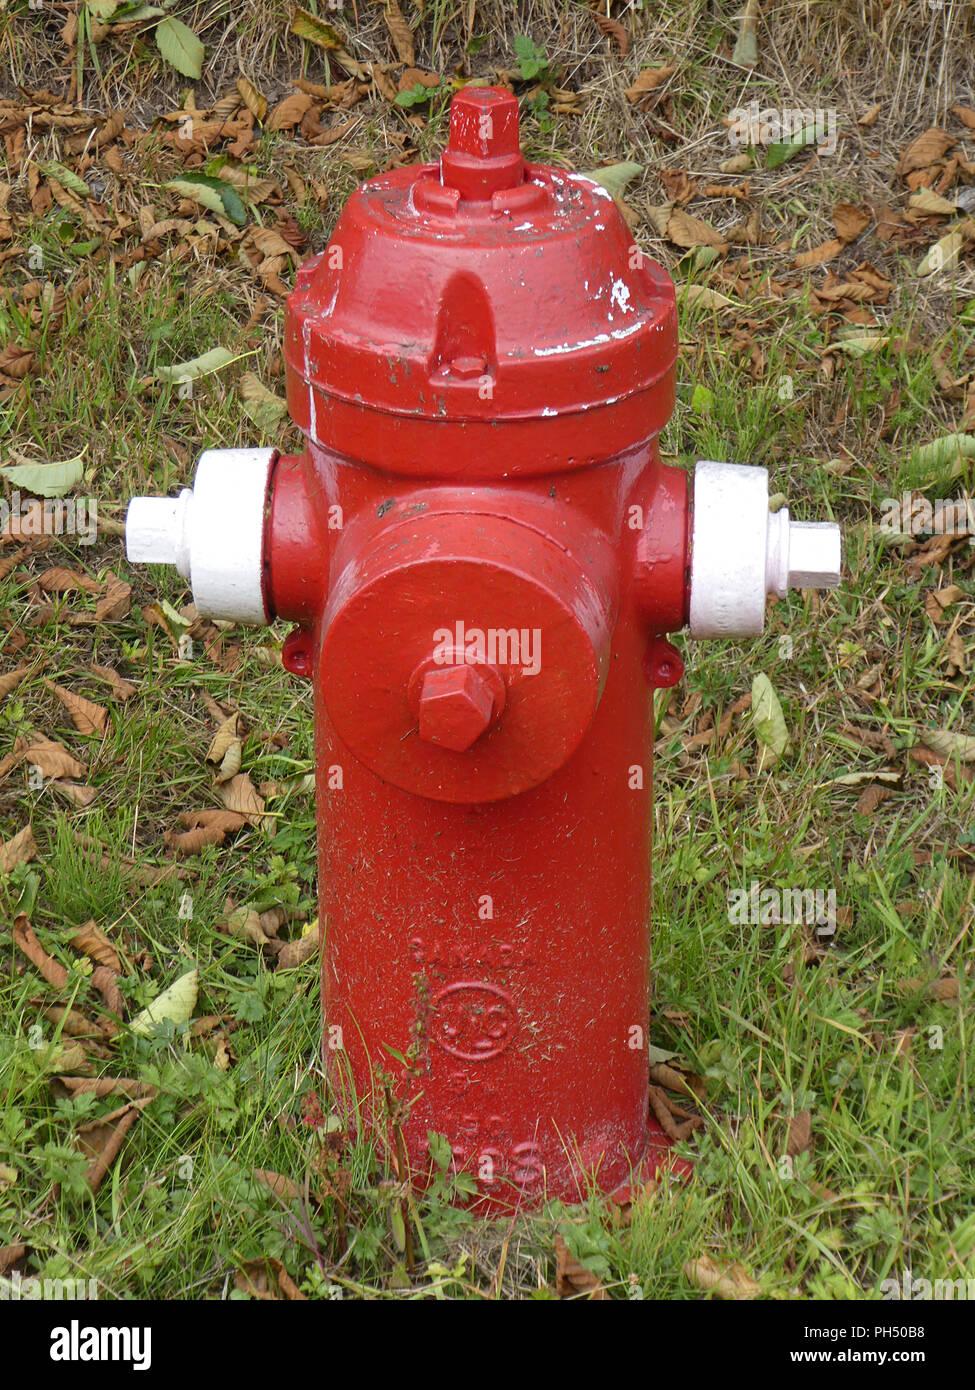 Fire Hydrant in British Columbia, Canada 2018 - Stock Image